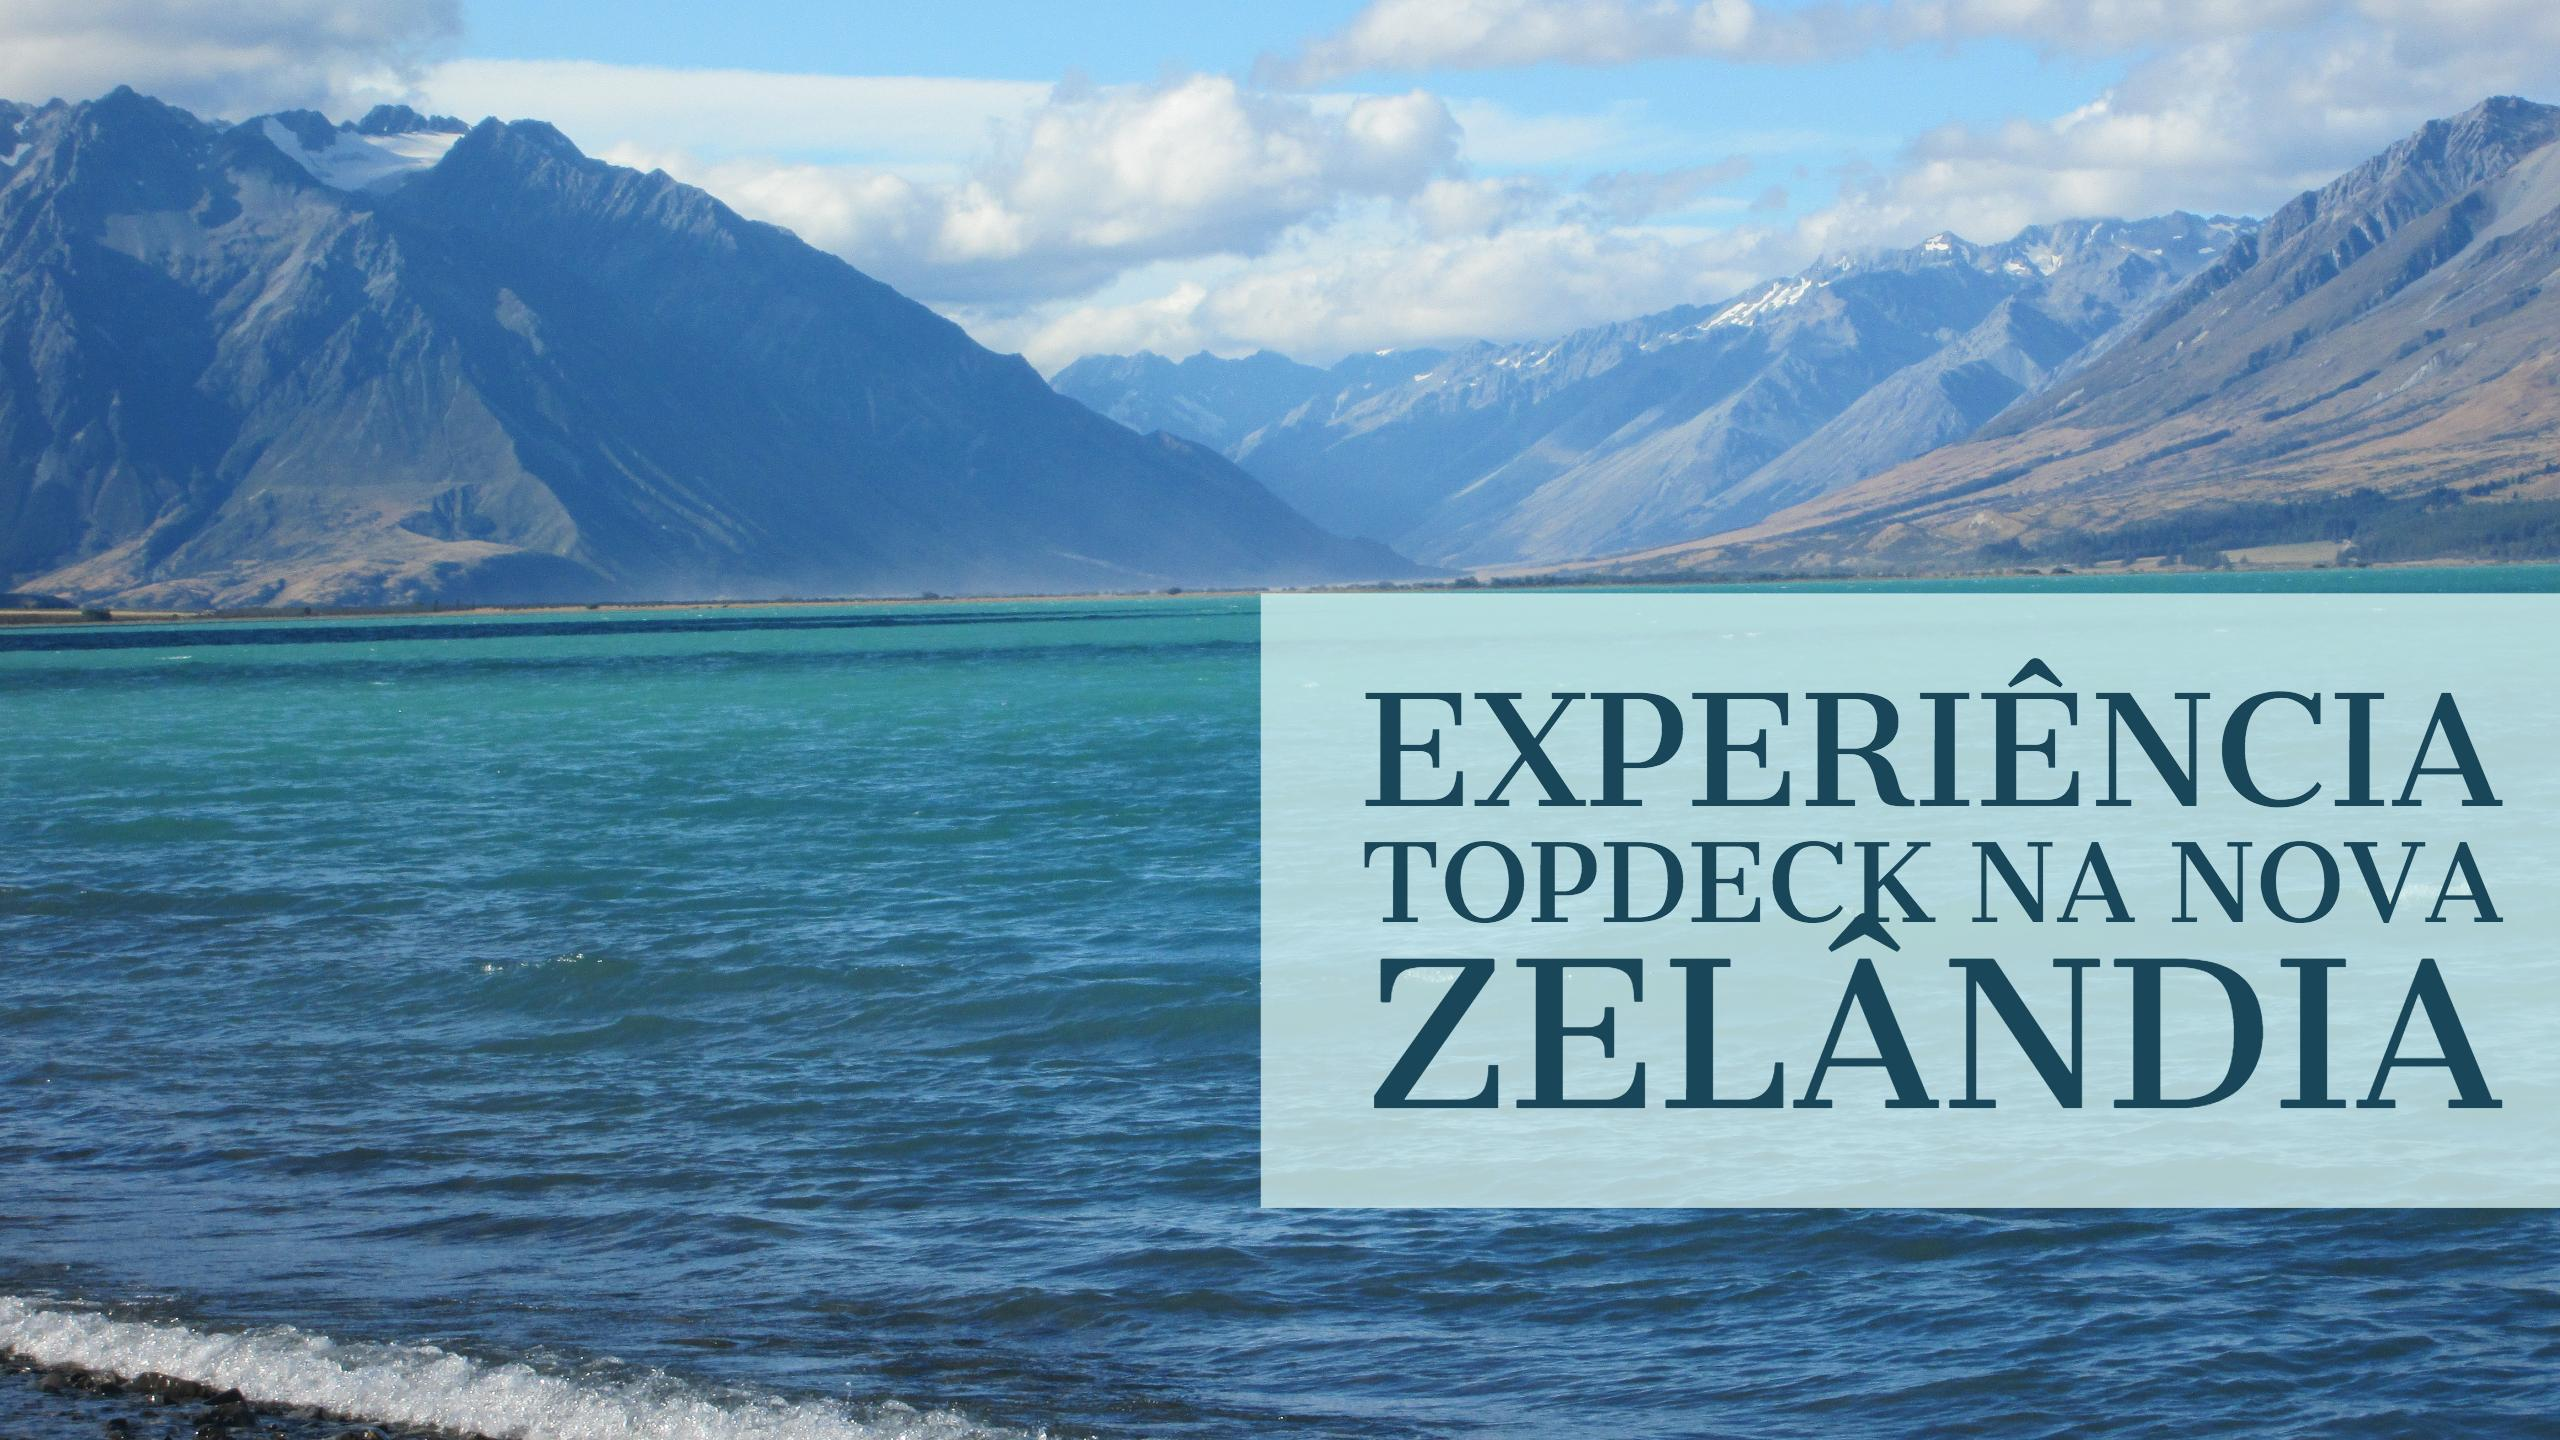 Experiência Topdeck na Nova Zelândia